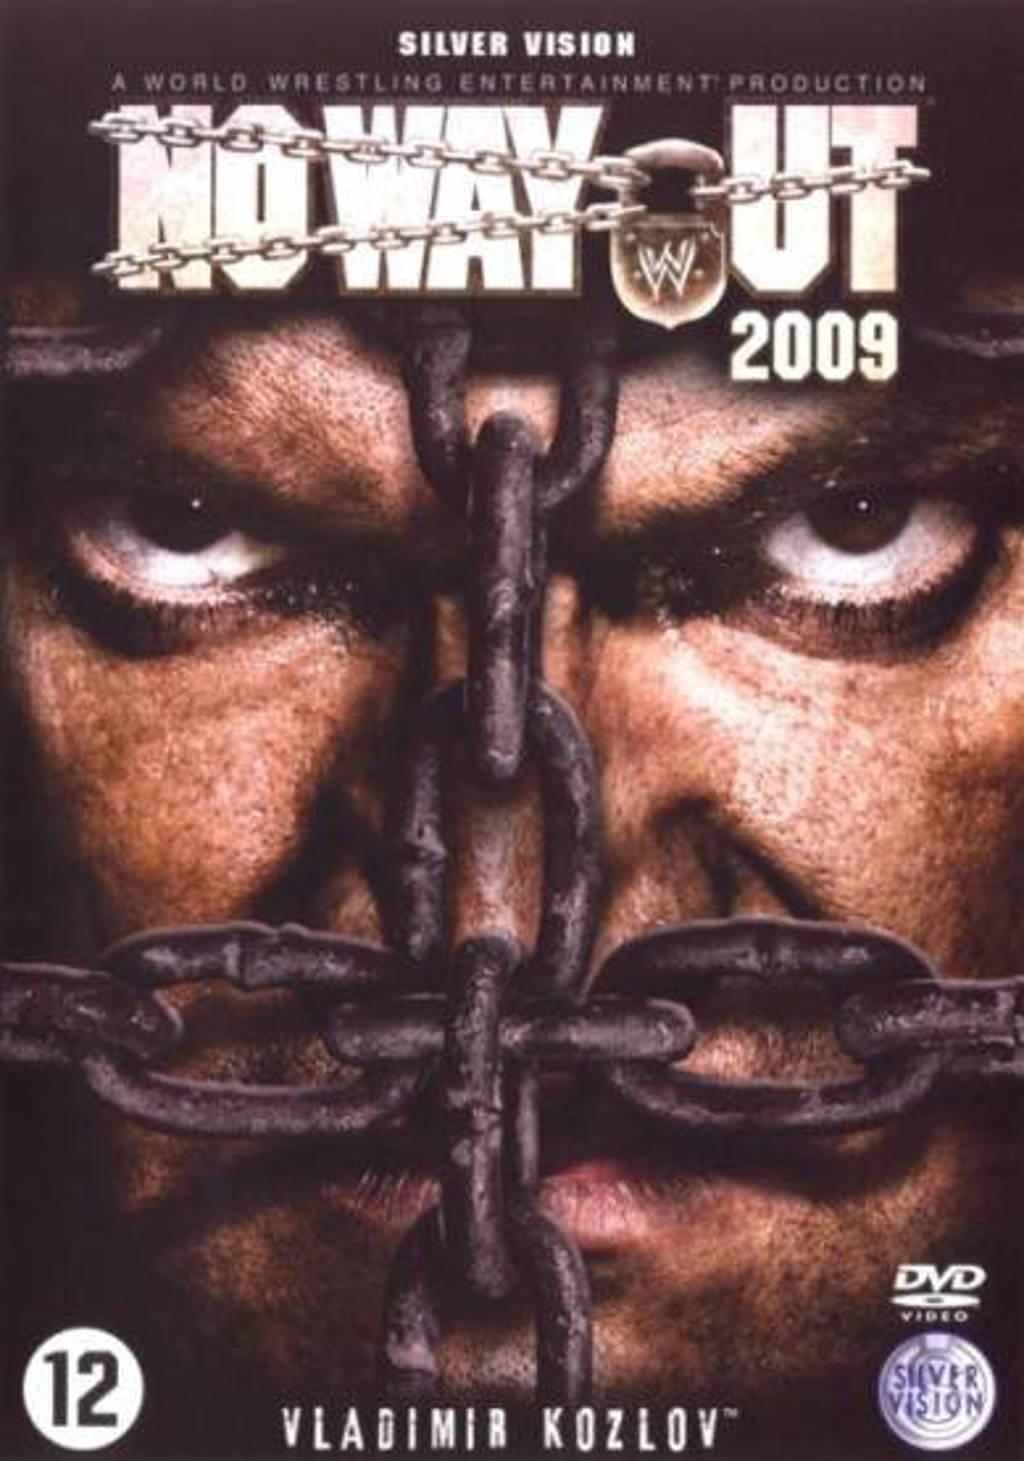 WWE - No way out 2009 (DVD)